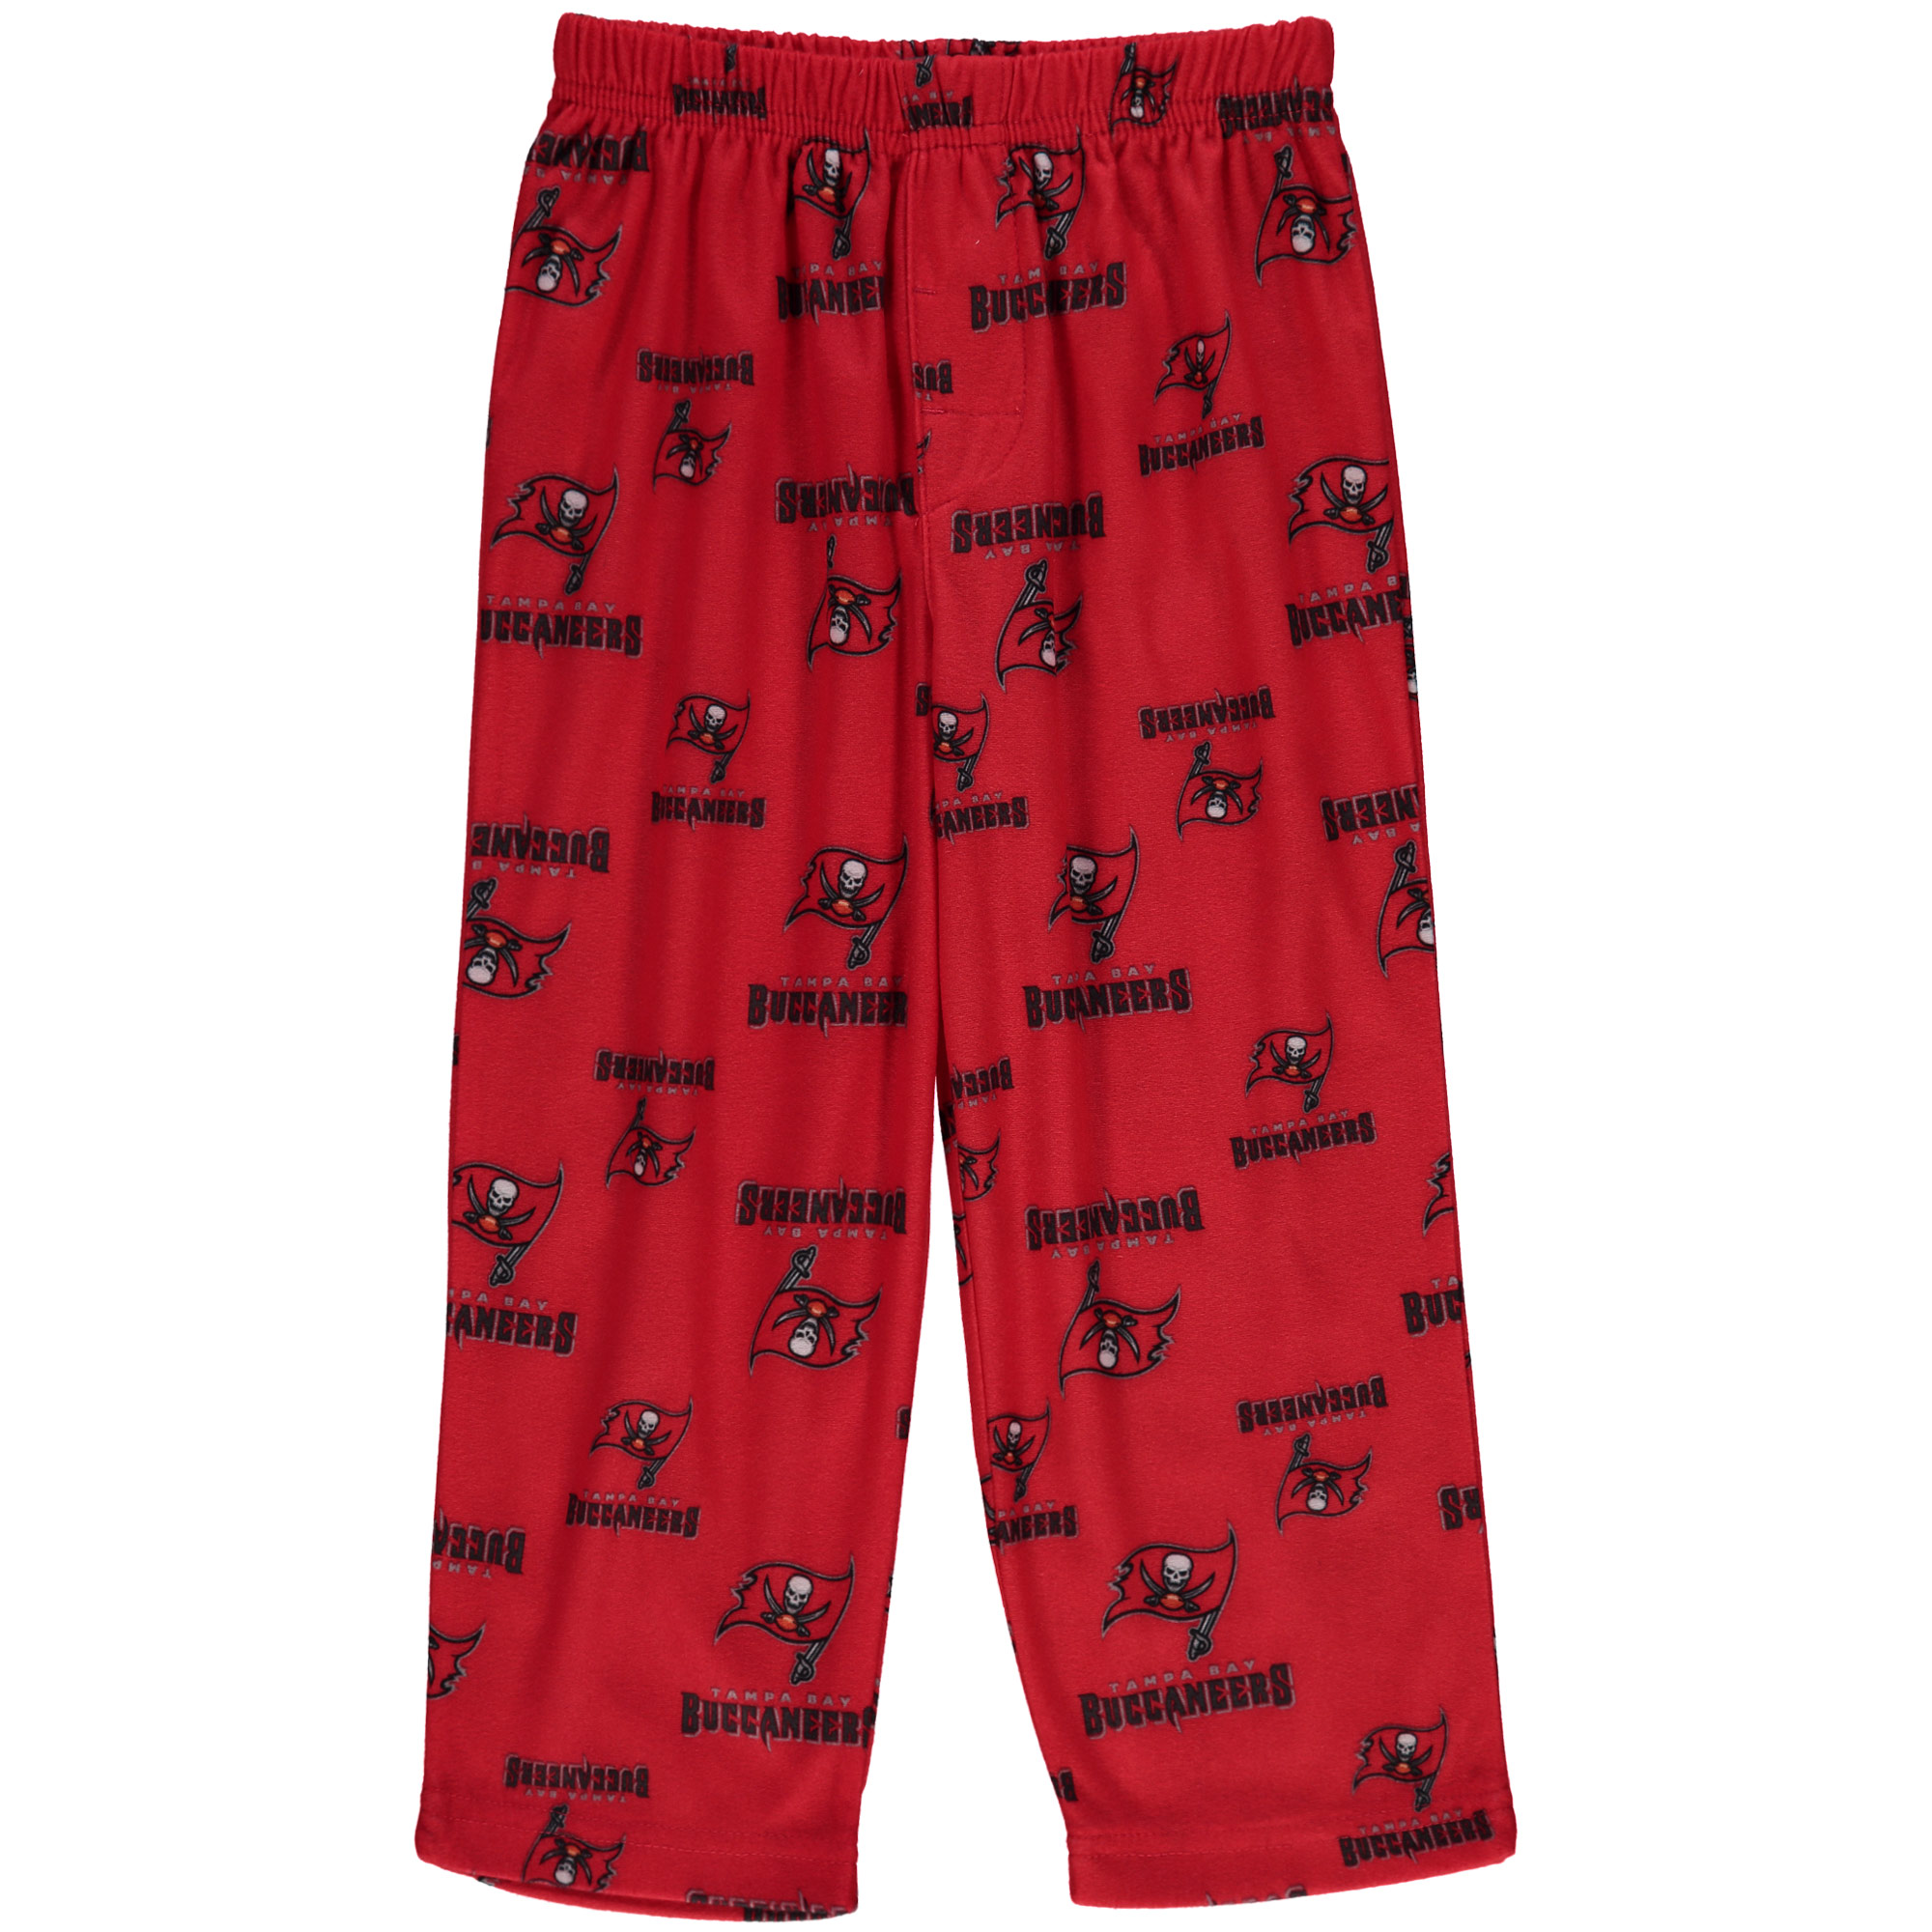 Tampa Bay Buccaneers Toddler Allover Print Pajama Pants - Red